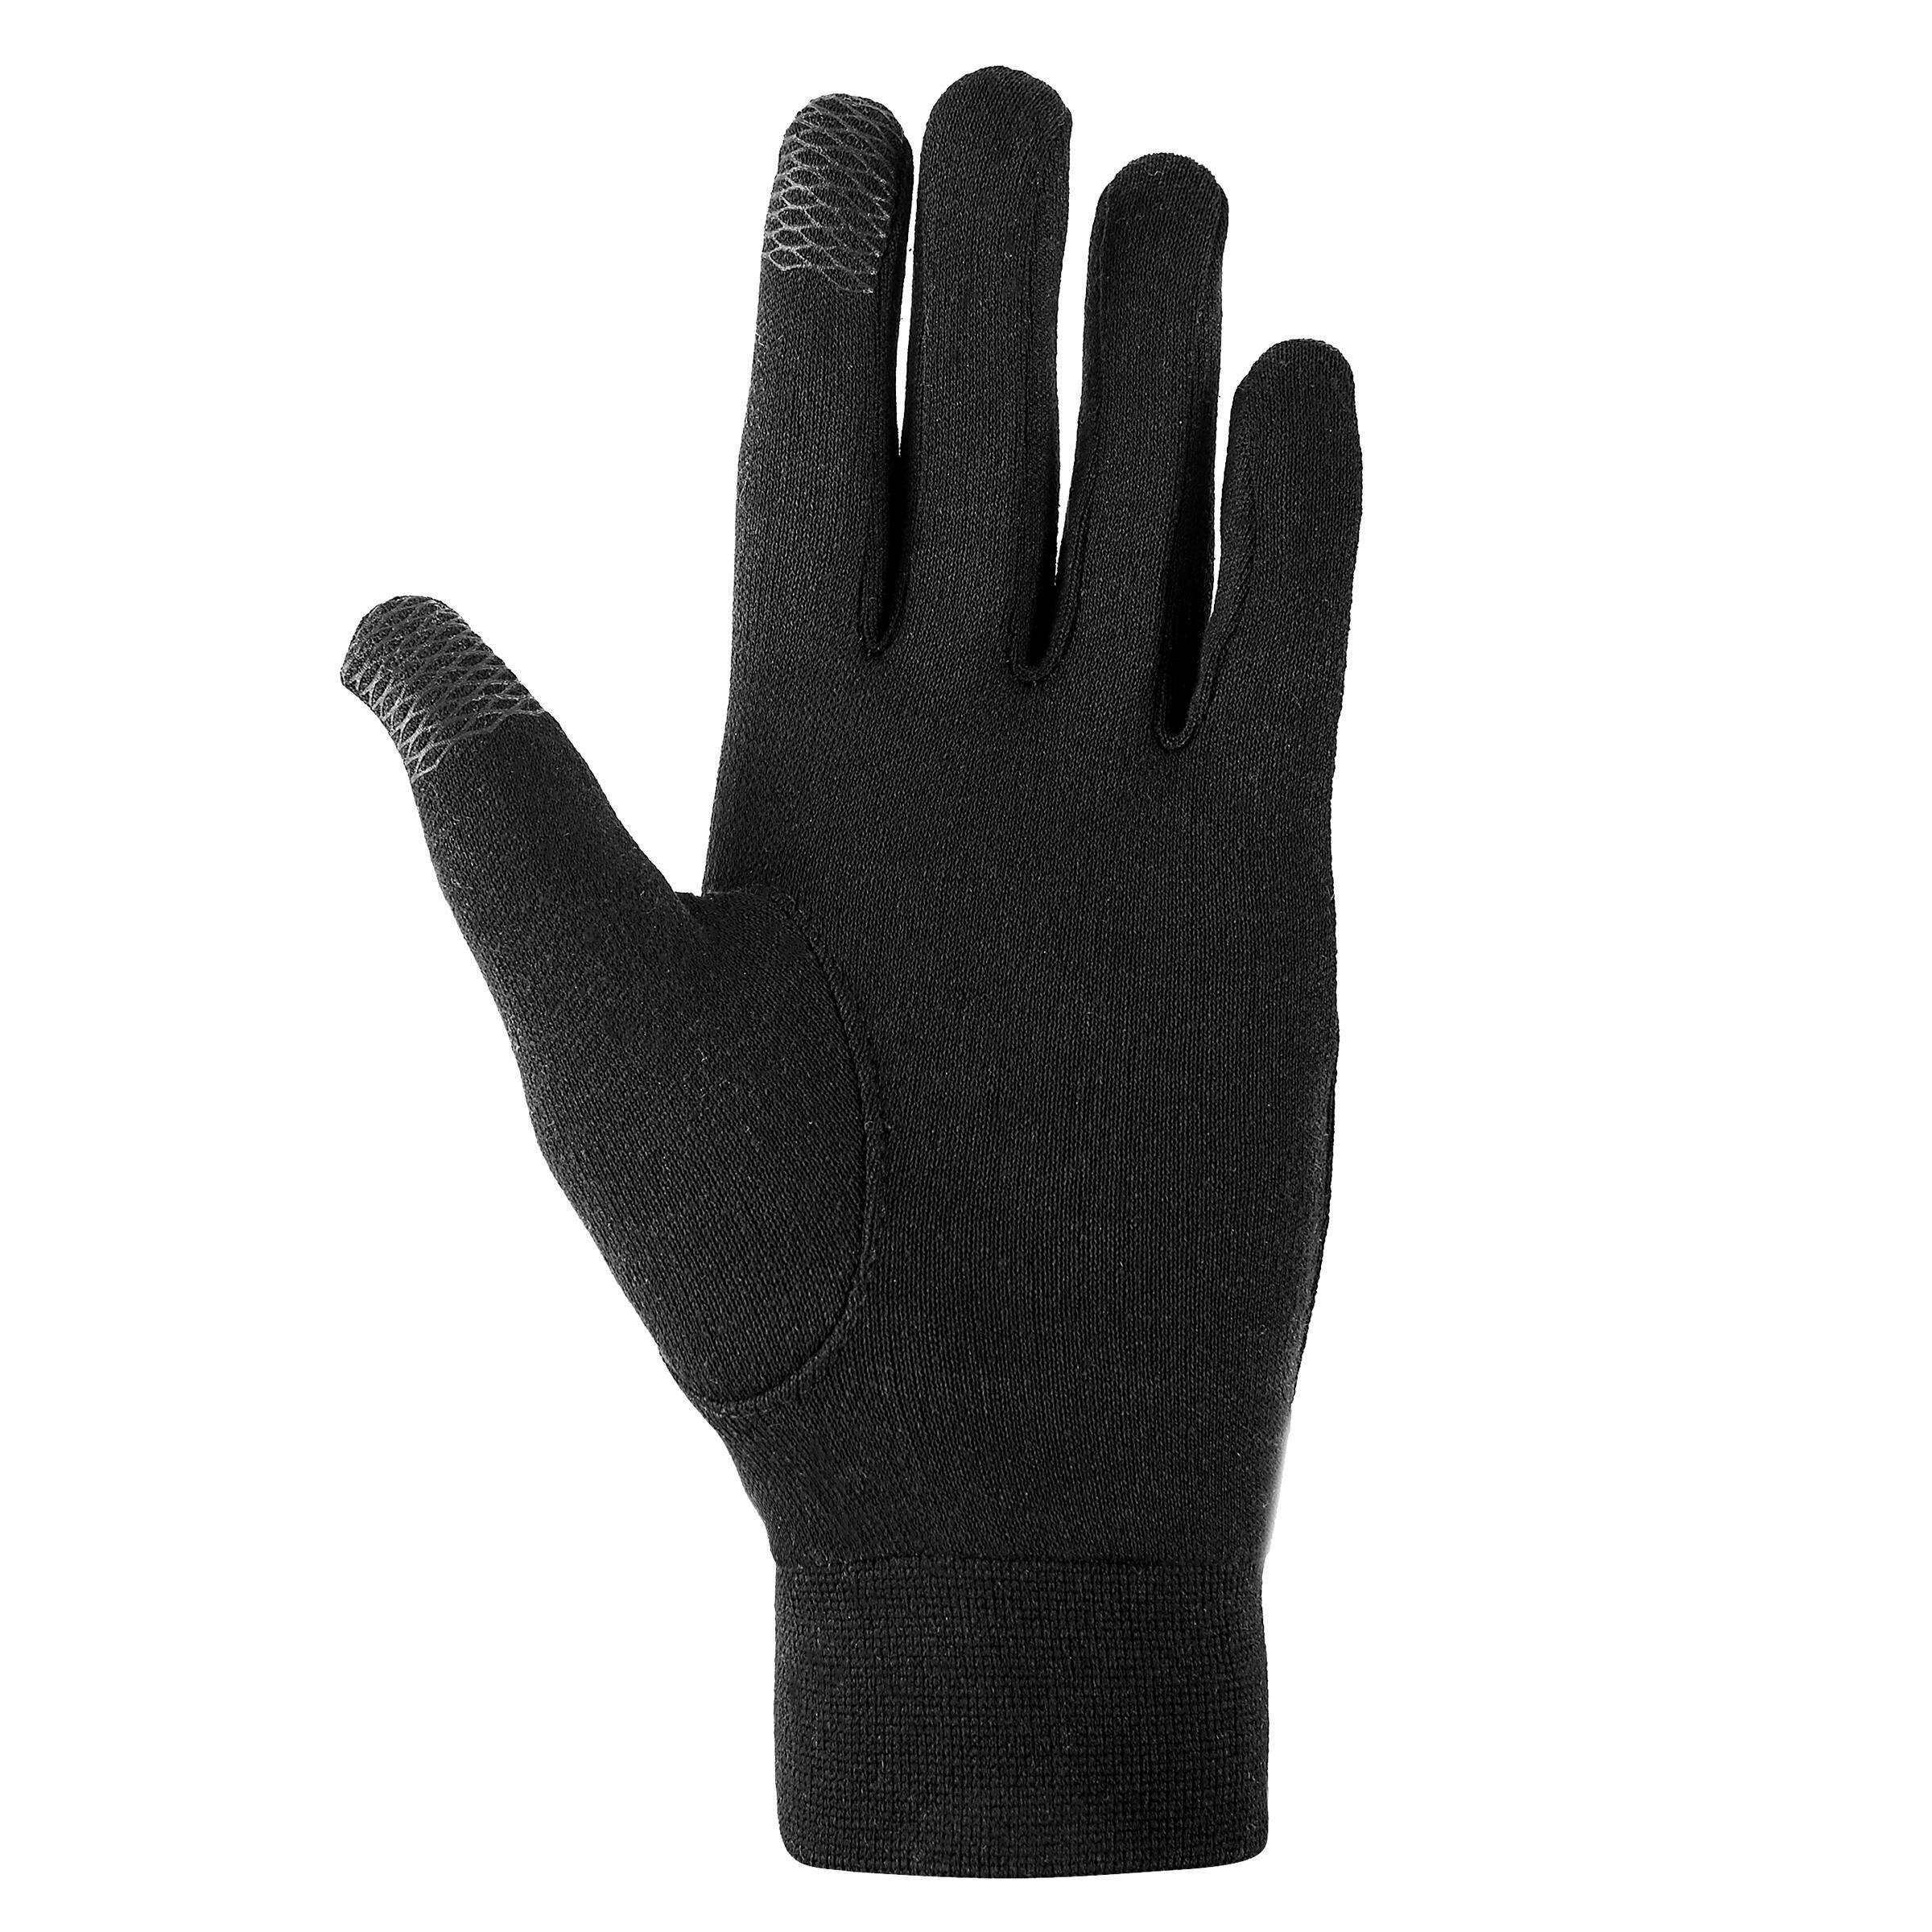 QUECHUA Black Trek 500 mountain trekking liner gloves M//L